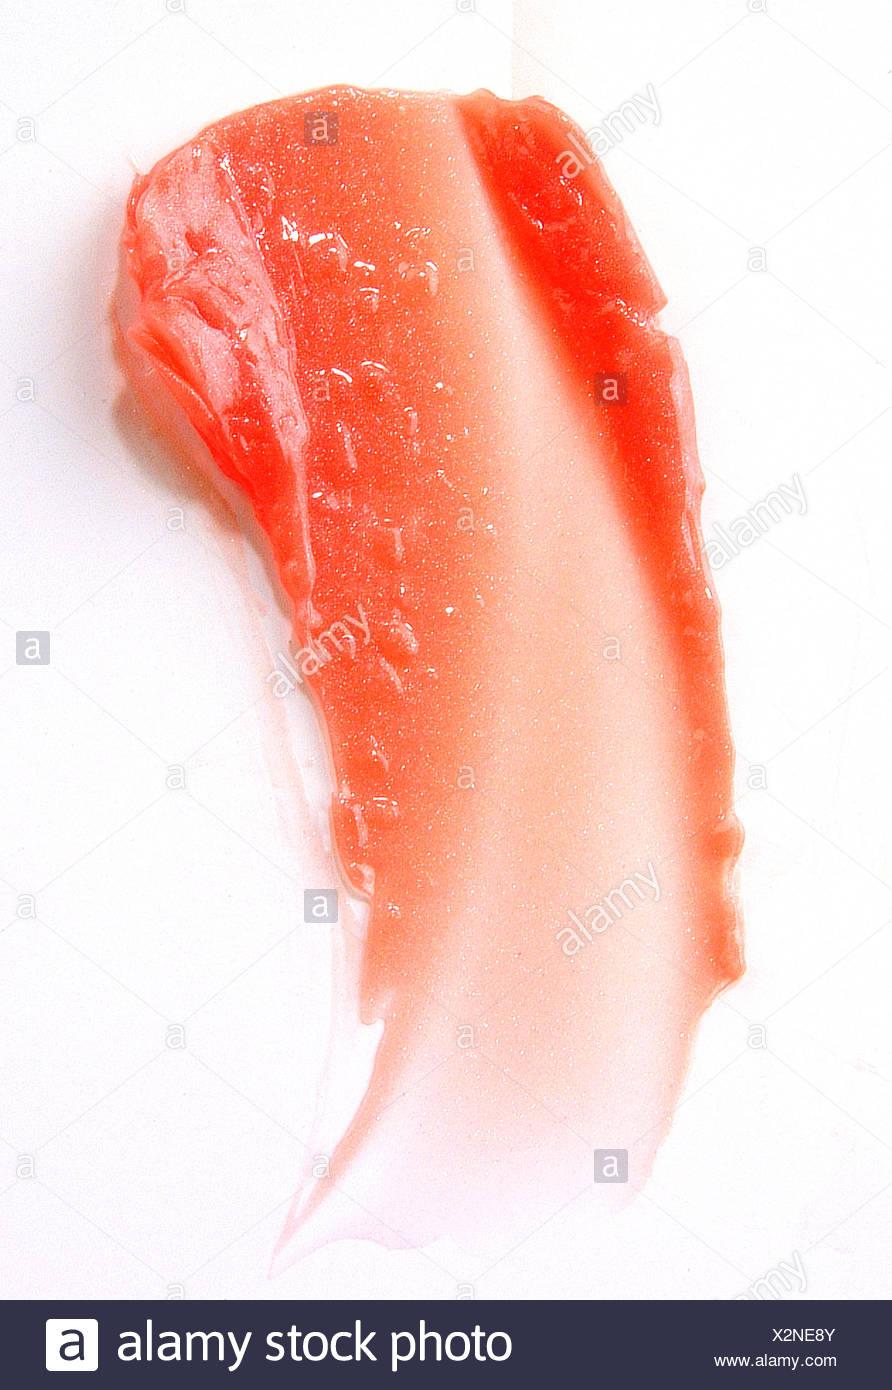 Smudge of orange lipgloss - Stock Image